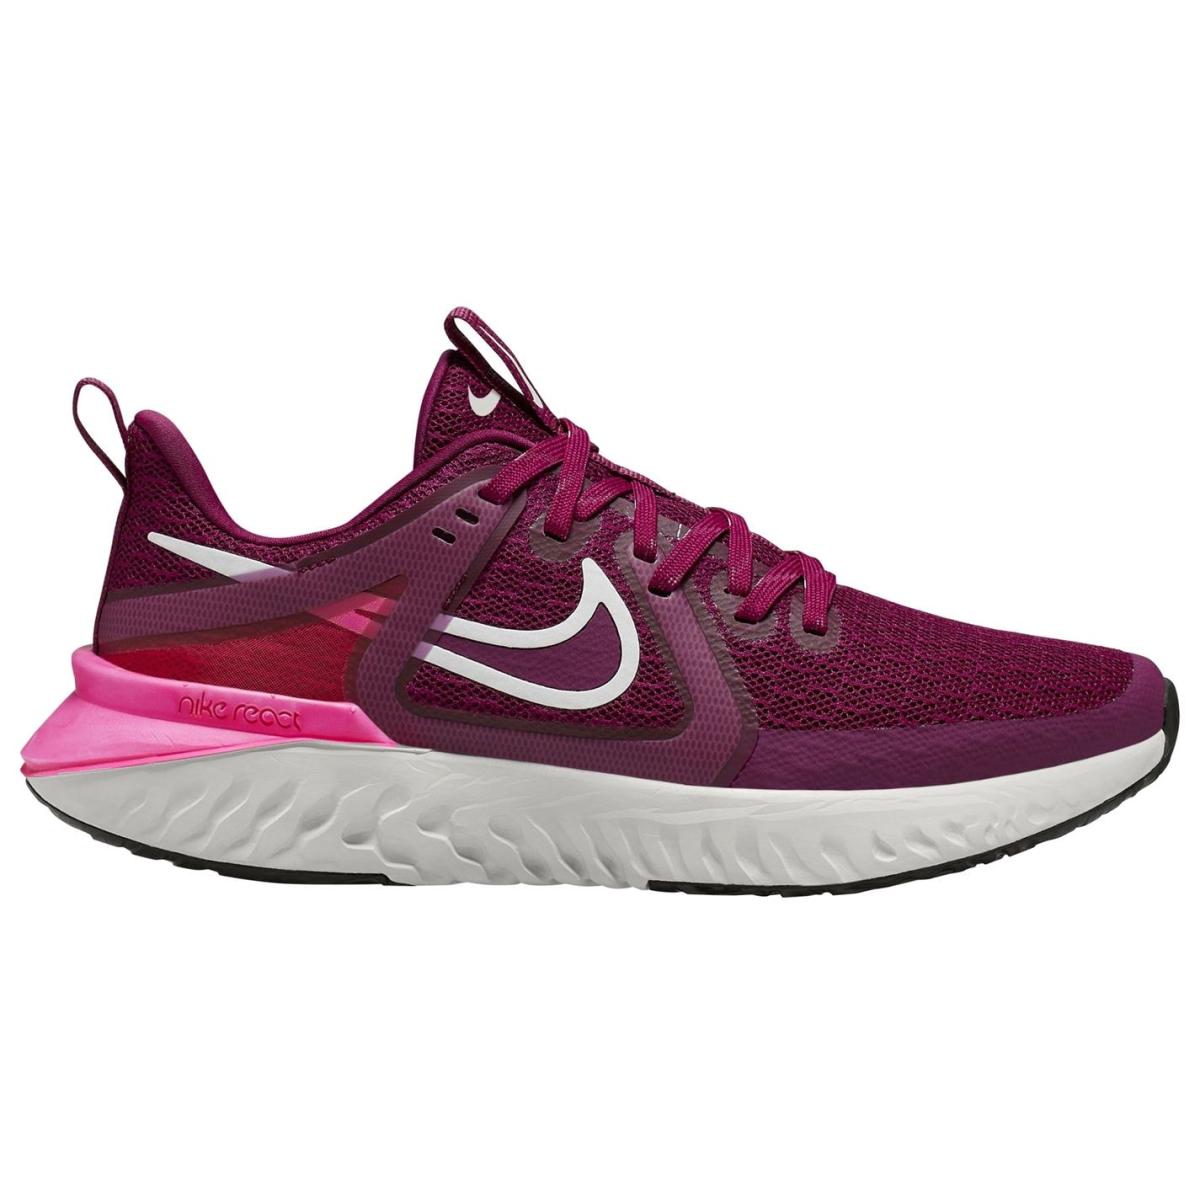 Nike Legend React 2 Laufschuhe Damen Sportschuhe Turnschuhe Jogging 4316